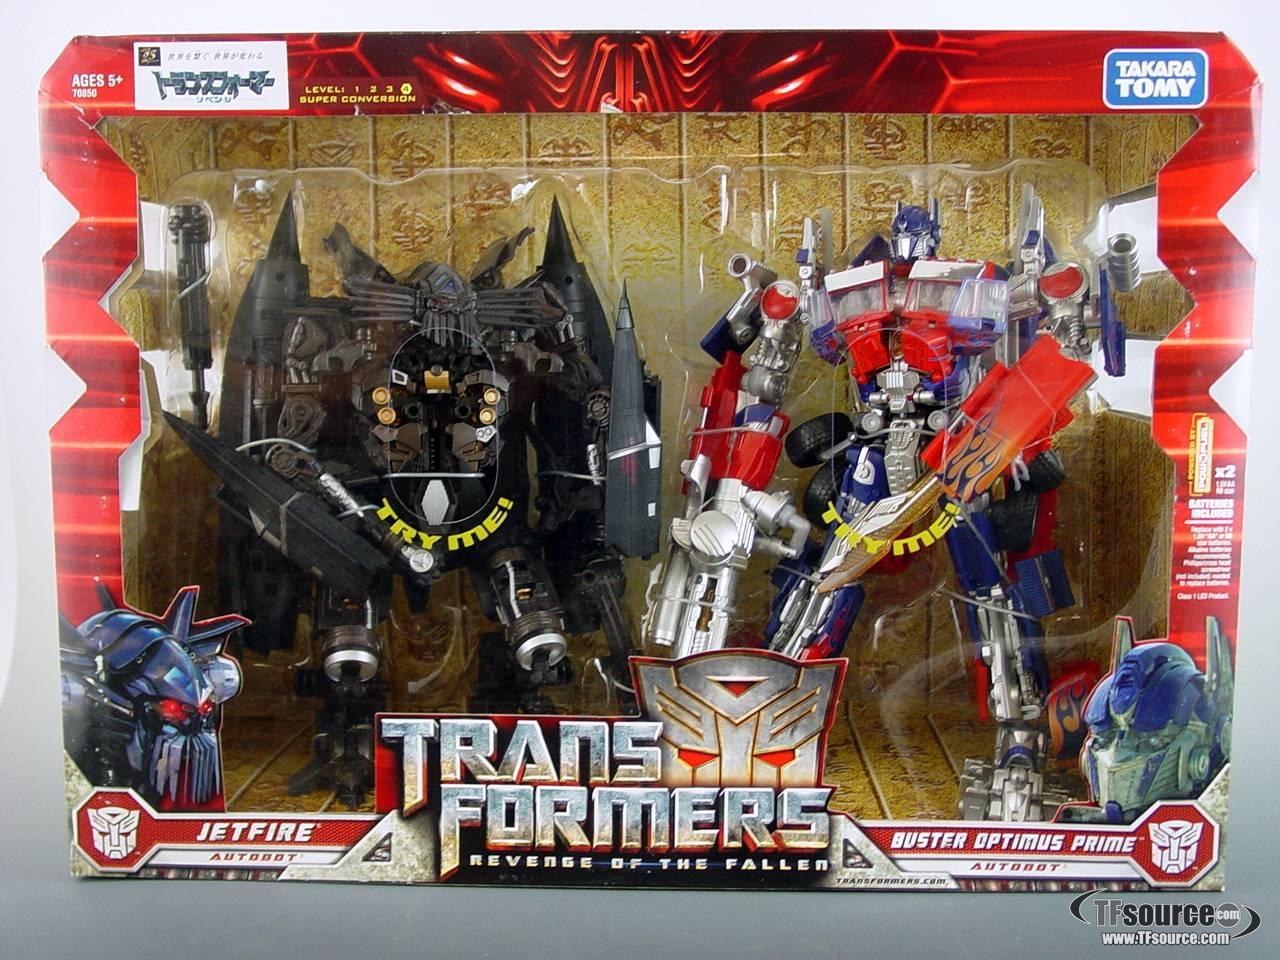 Revenge of the Fallen - Jetpower Buster Optimus Prime and Jetfire - MISB